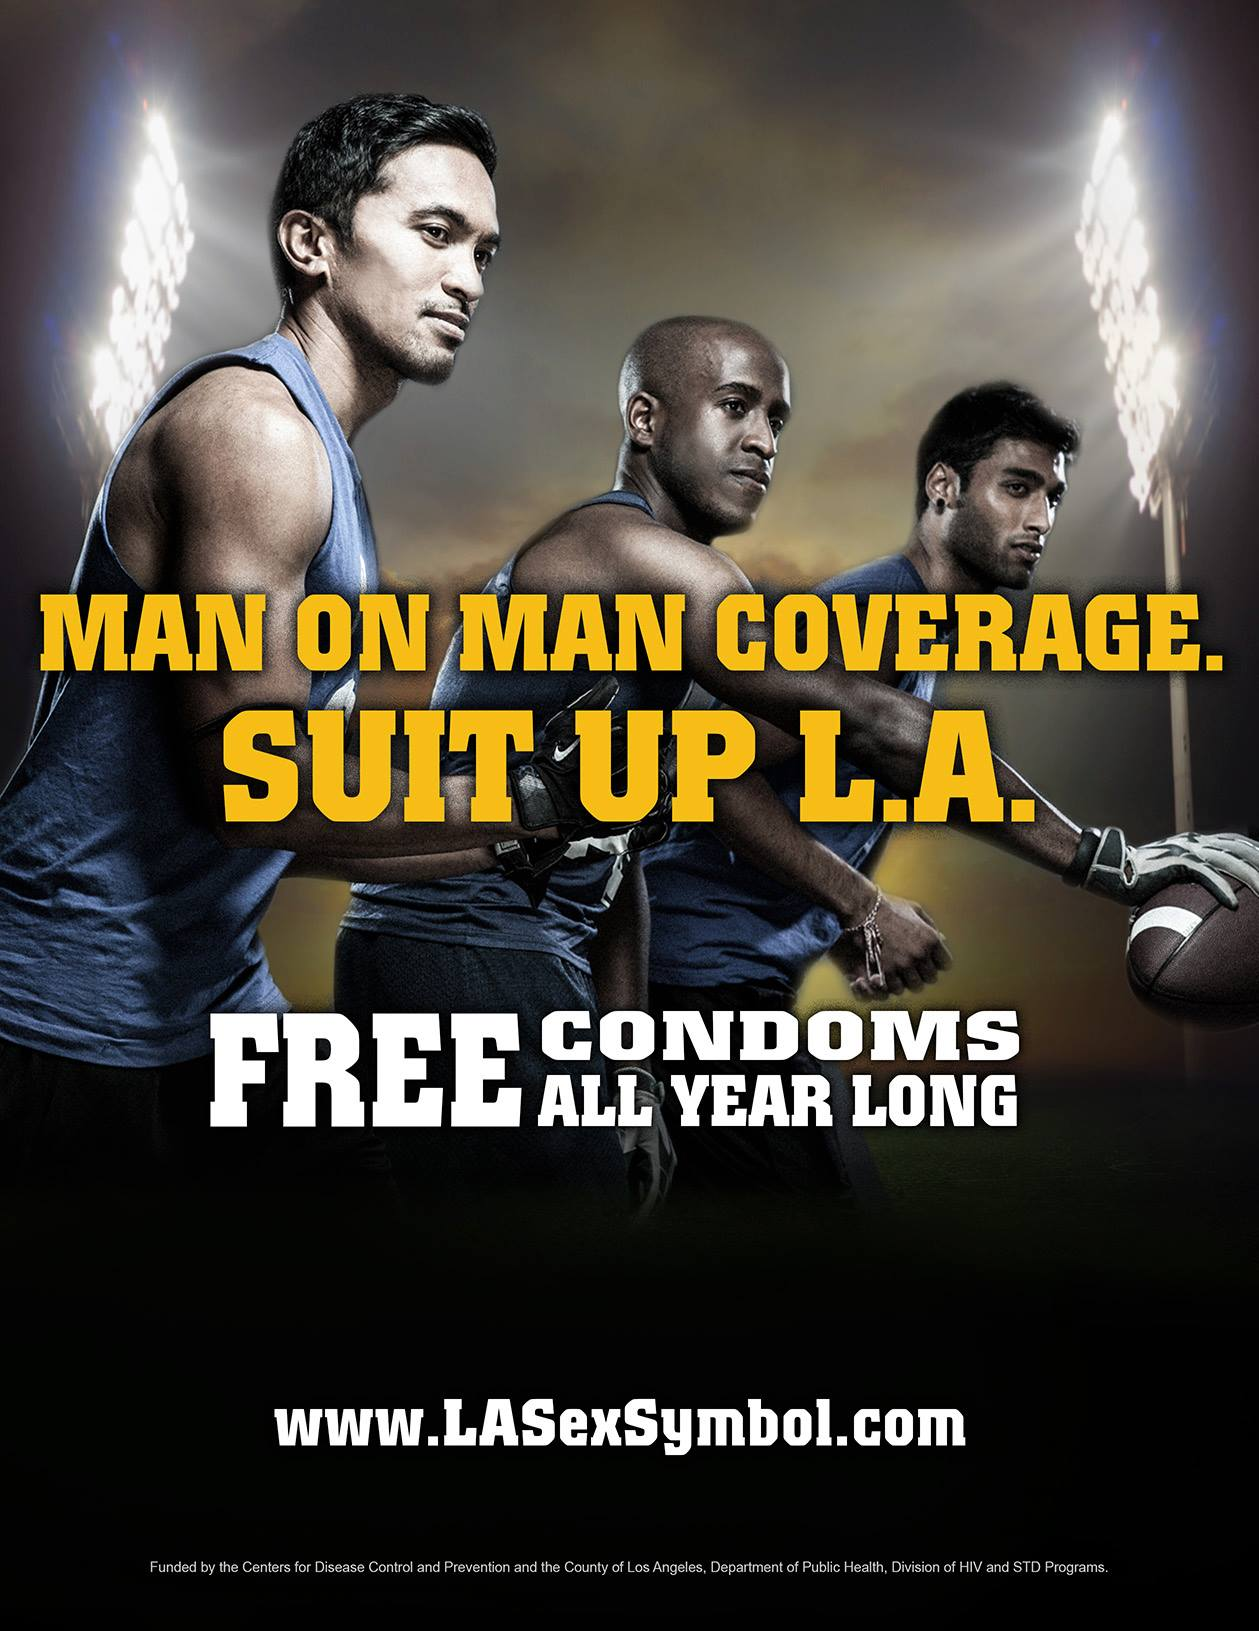 LA Sex Symbol Campaign Photography by Bradford Rogne